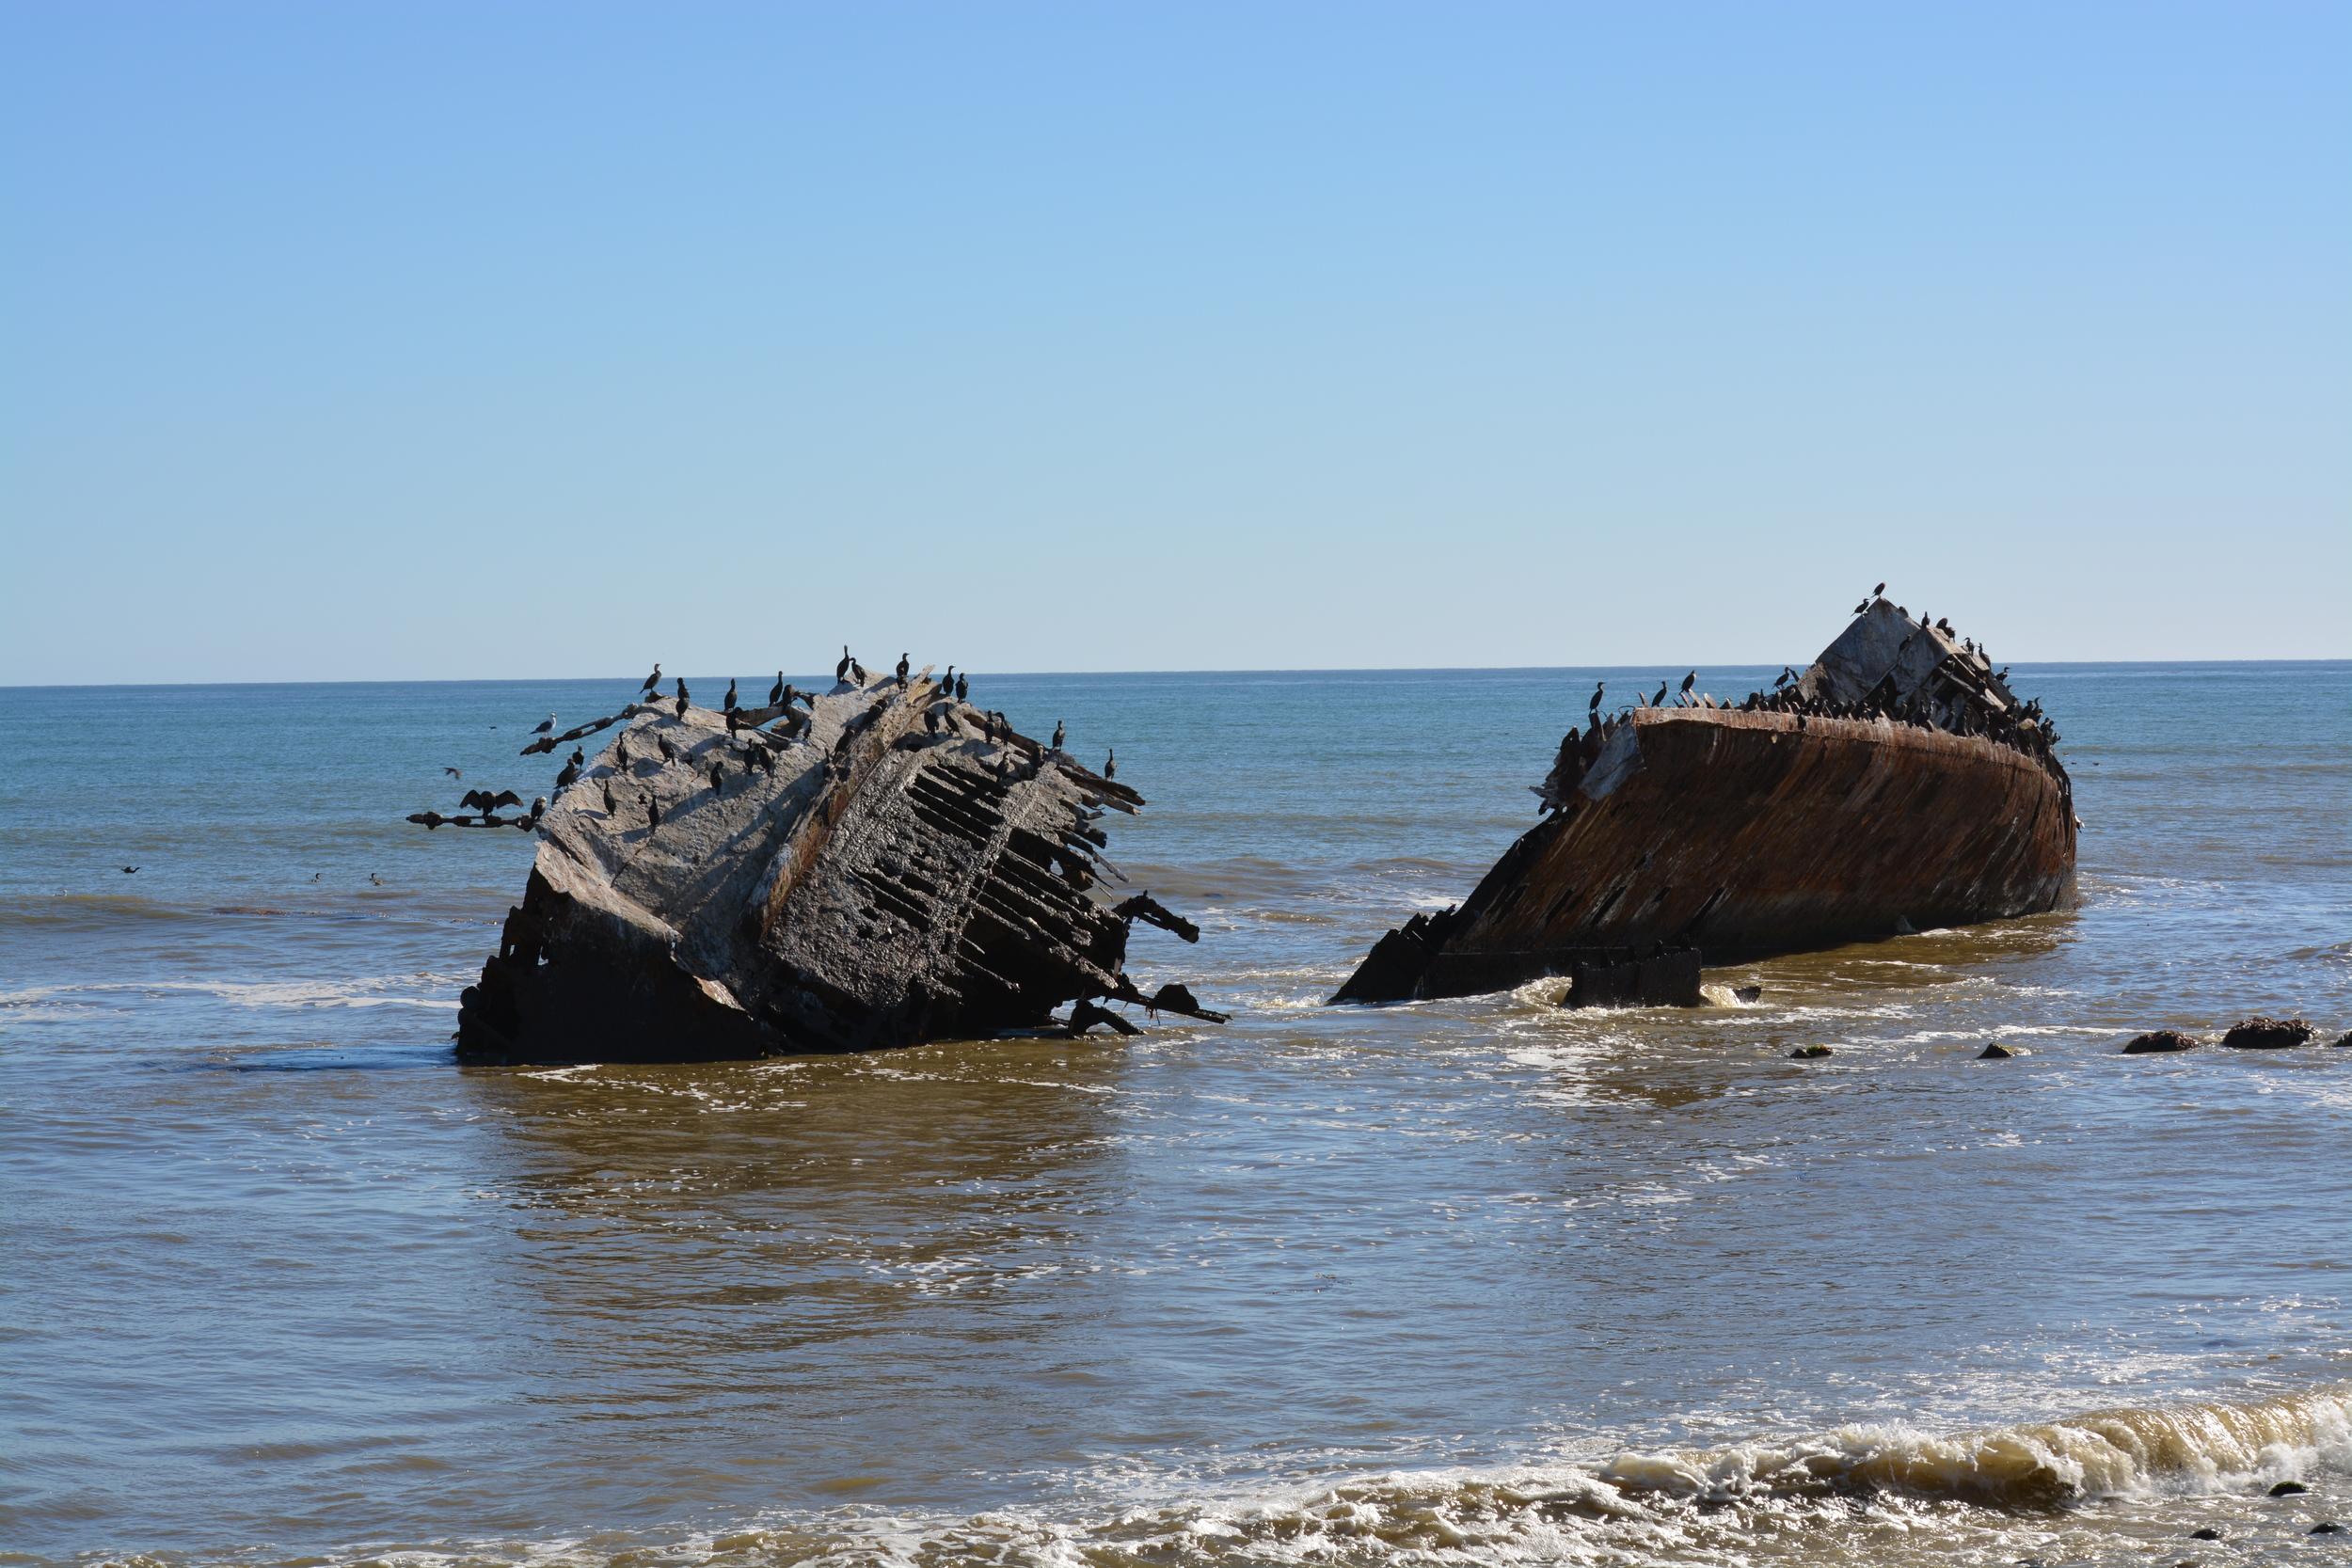 Baja California 10-5-13 Shipwrecks Surfing Adventure Ocean Experience Surf School San Diego (87).JPG